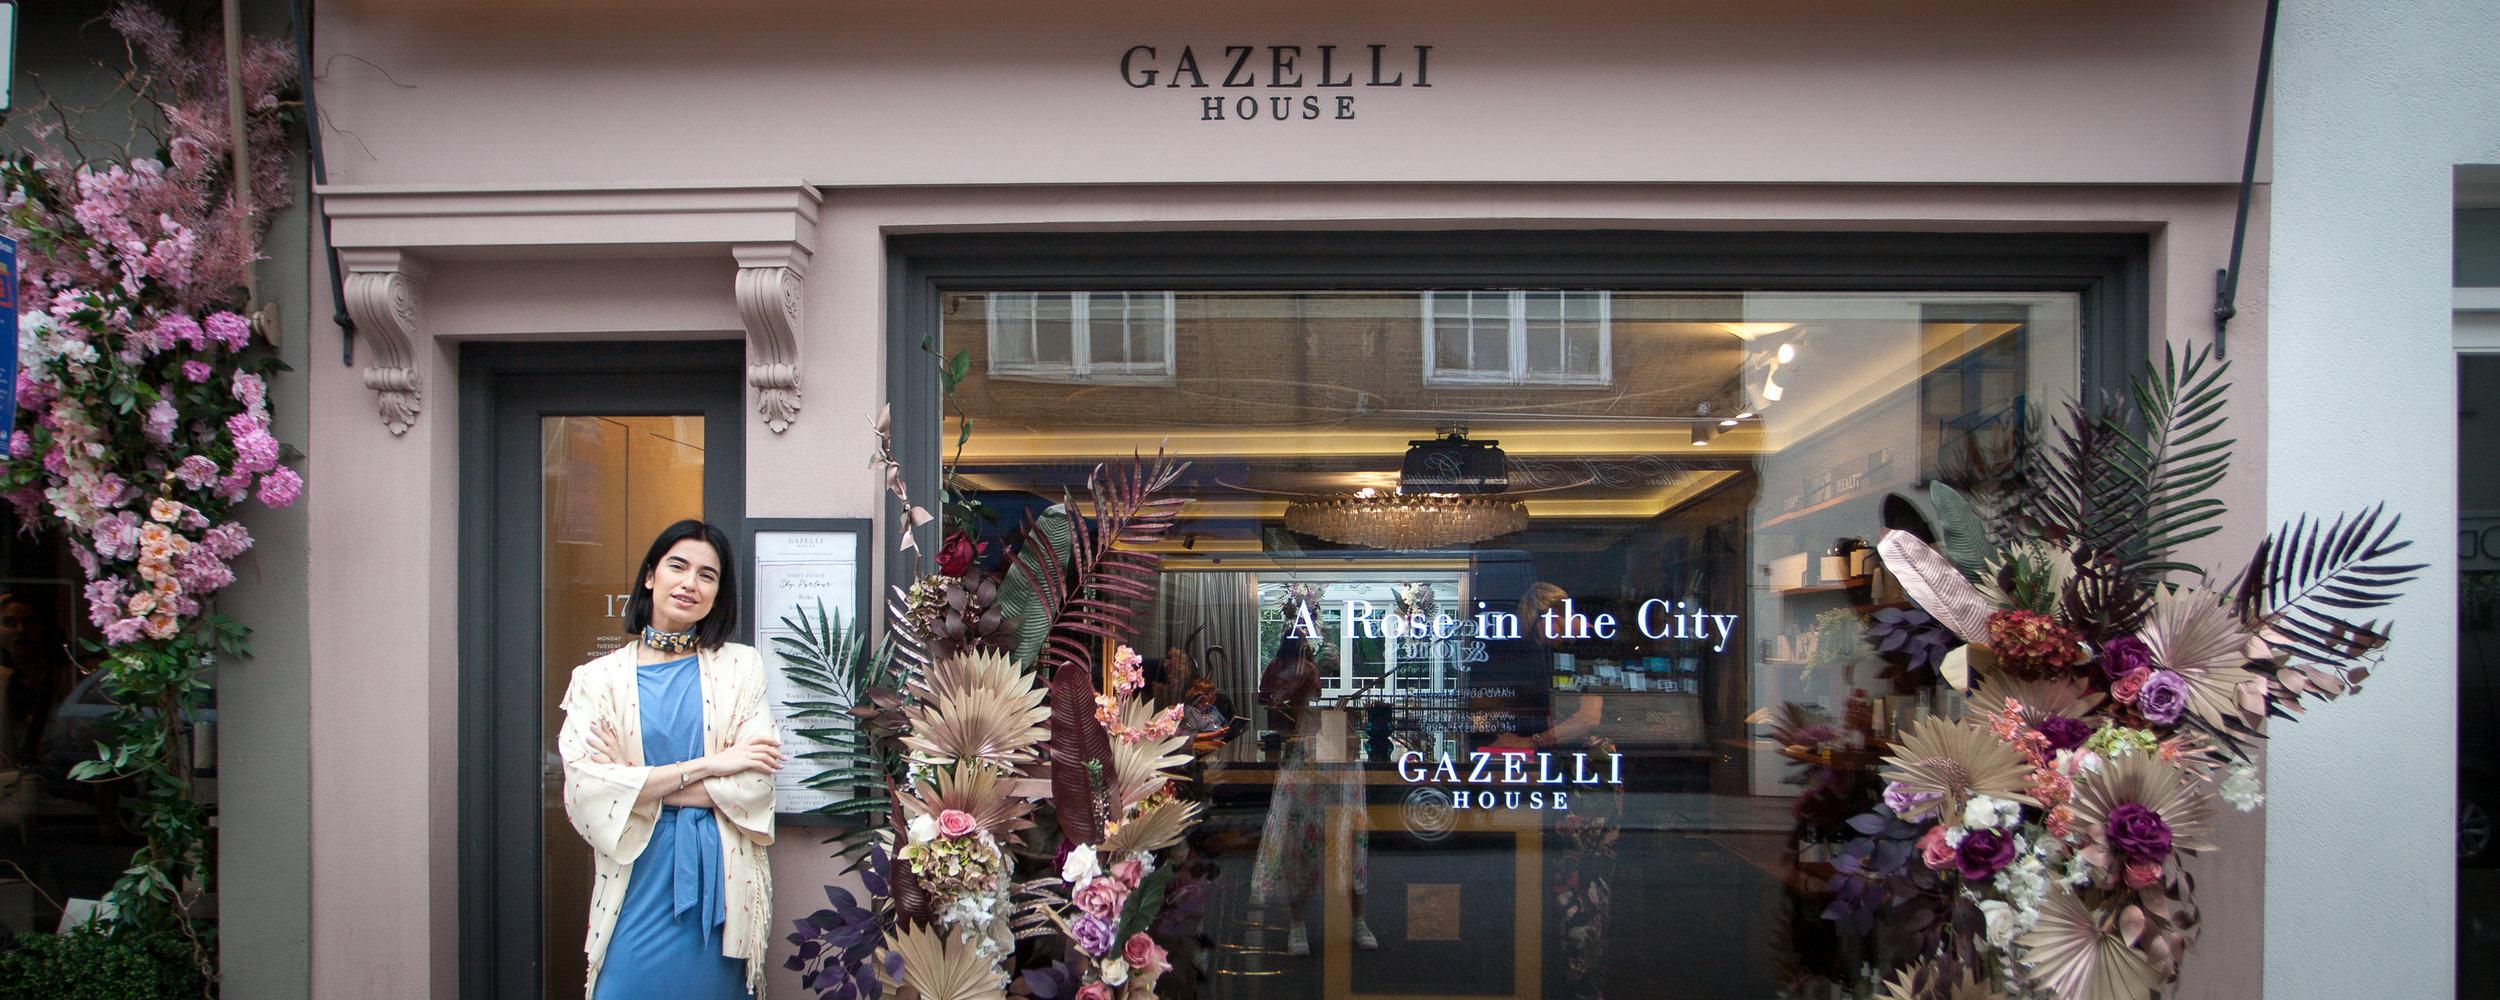 Jamila Askarova, Gazelli founder at Gazelli House in South Kensington